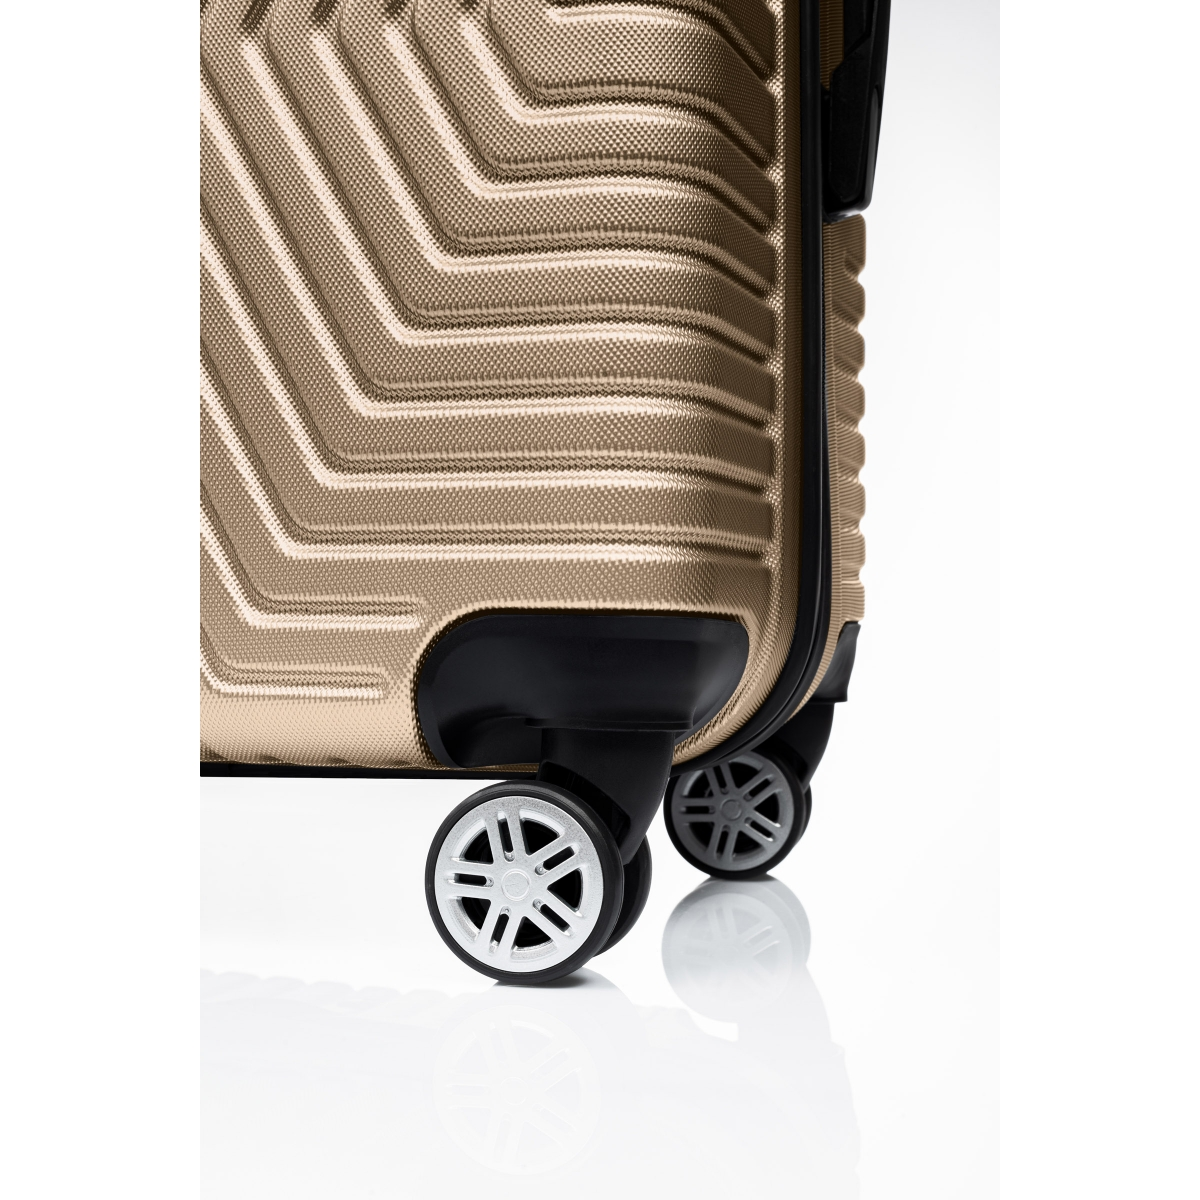 G&D Polo Suitcase ABS 3'lü Lüx Valiz Seyahat Seti - Model:600.06 Gold